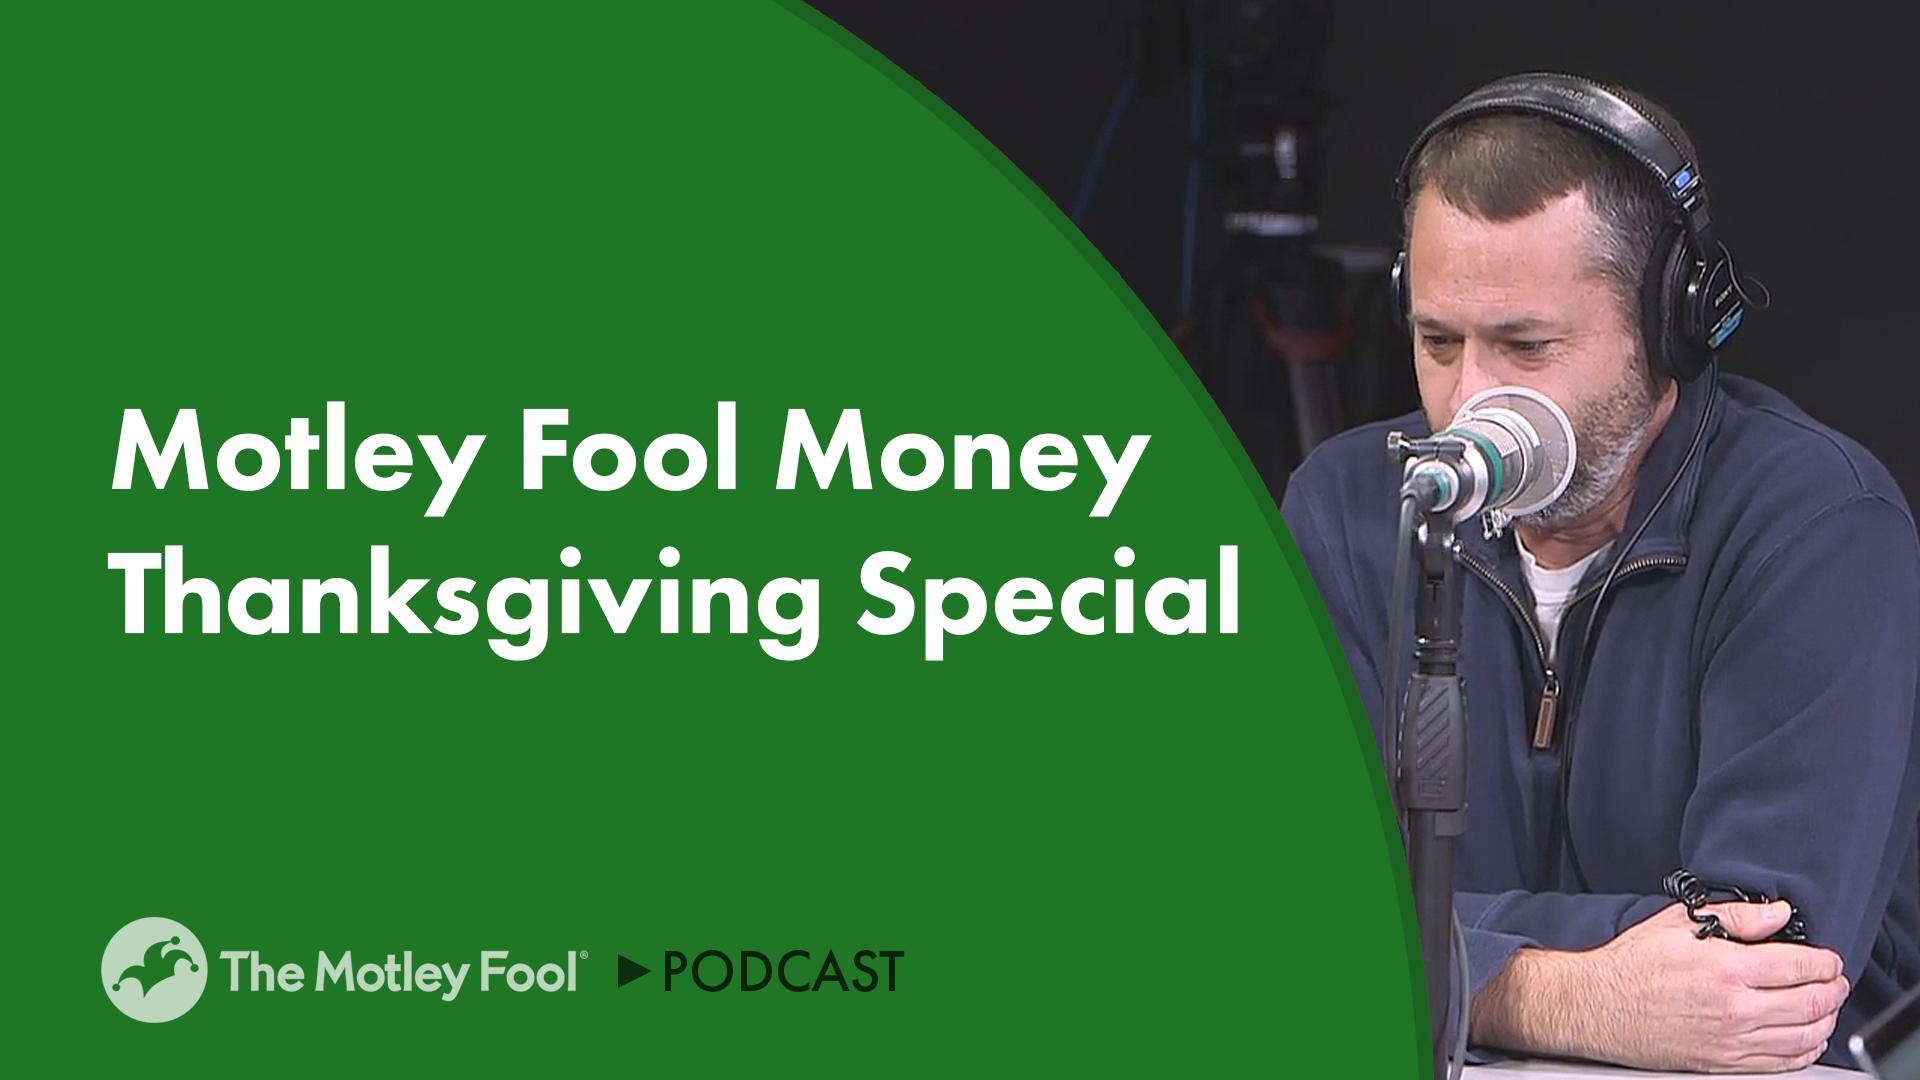 Motley Fool Money Thanksgiving Special